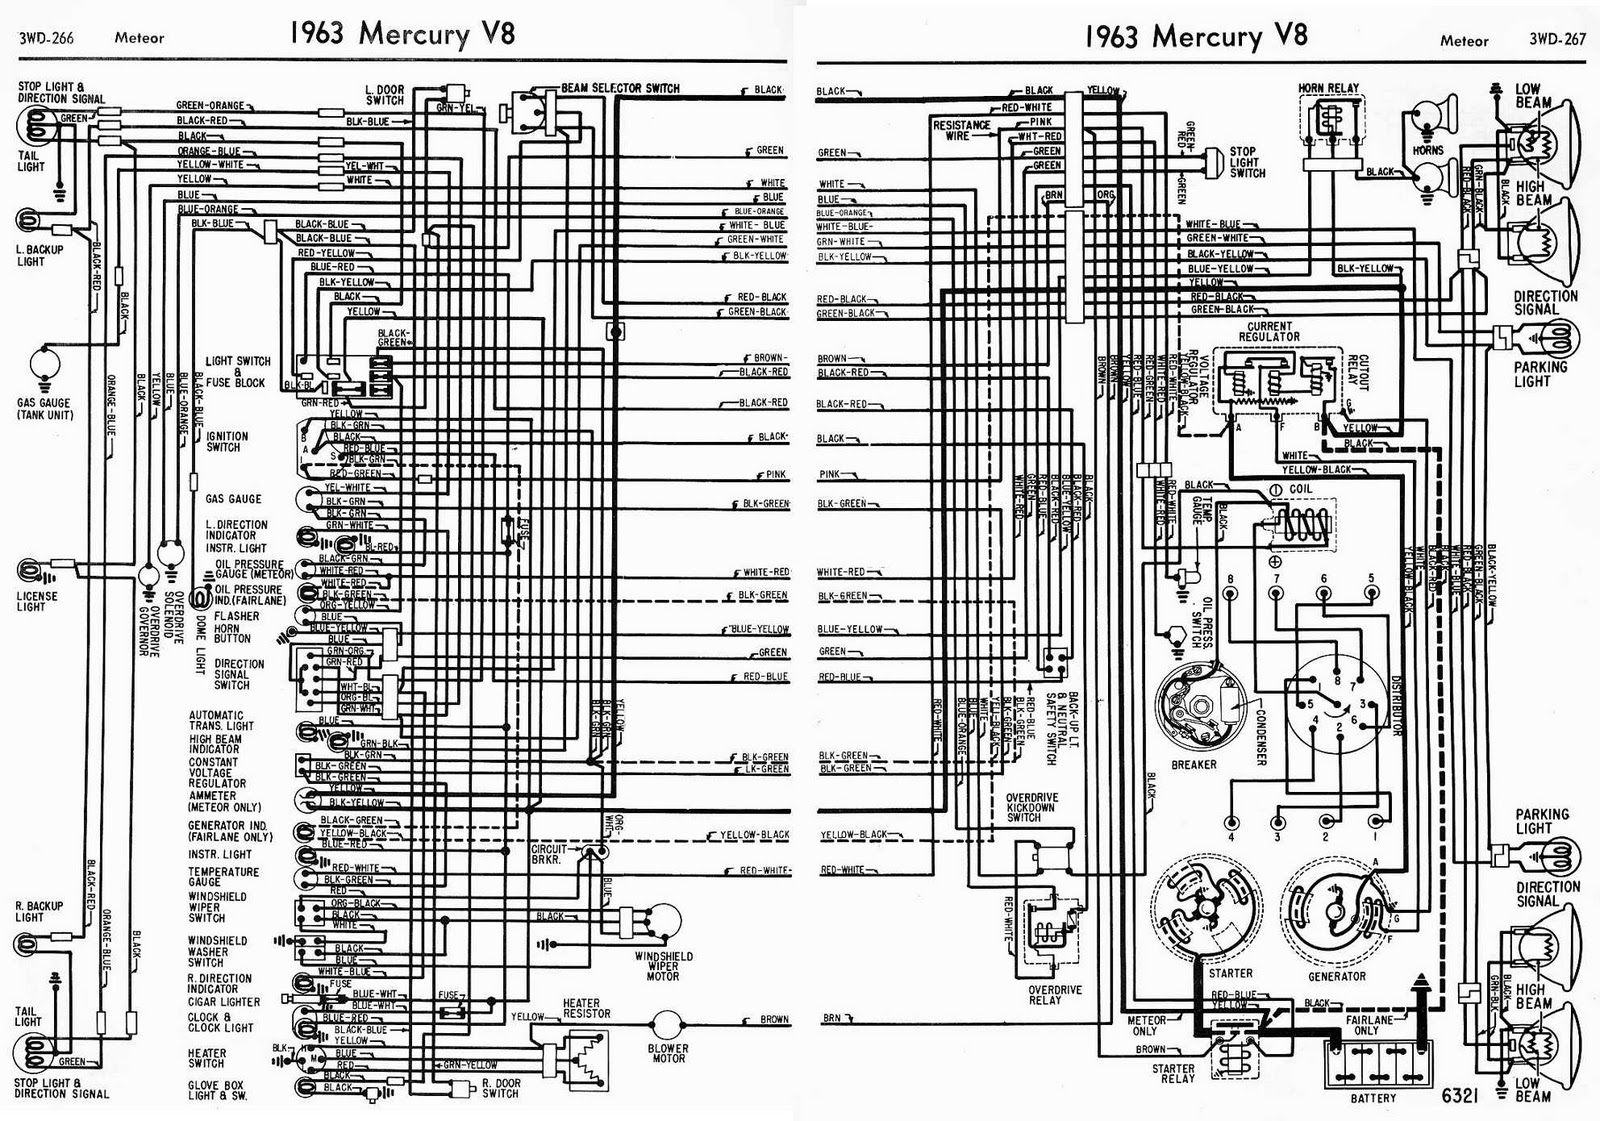 Mercury Wiring Diagram Of Ceiling Fan 1956 Harness Manual E Books Diagram1956 Diagram1954 Monterey Data